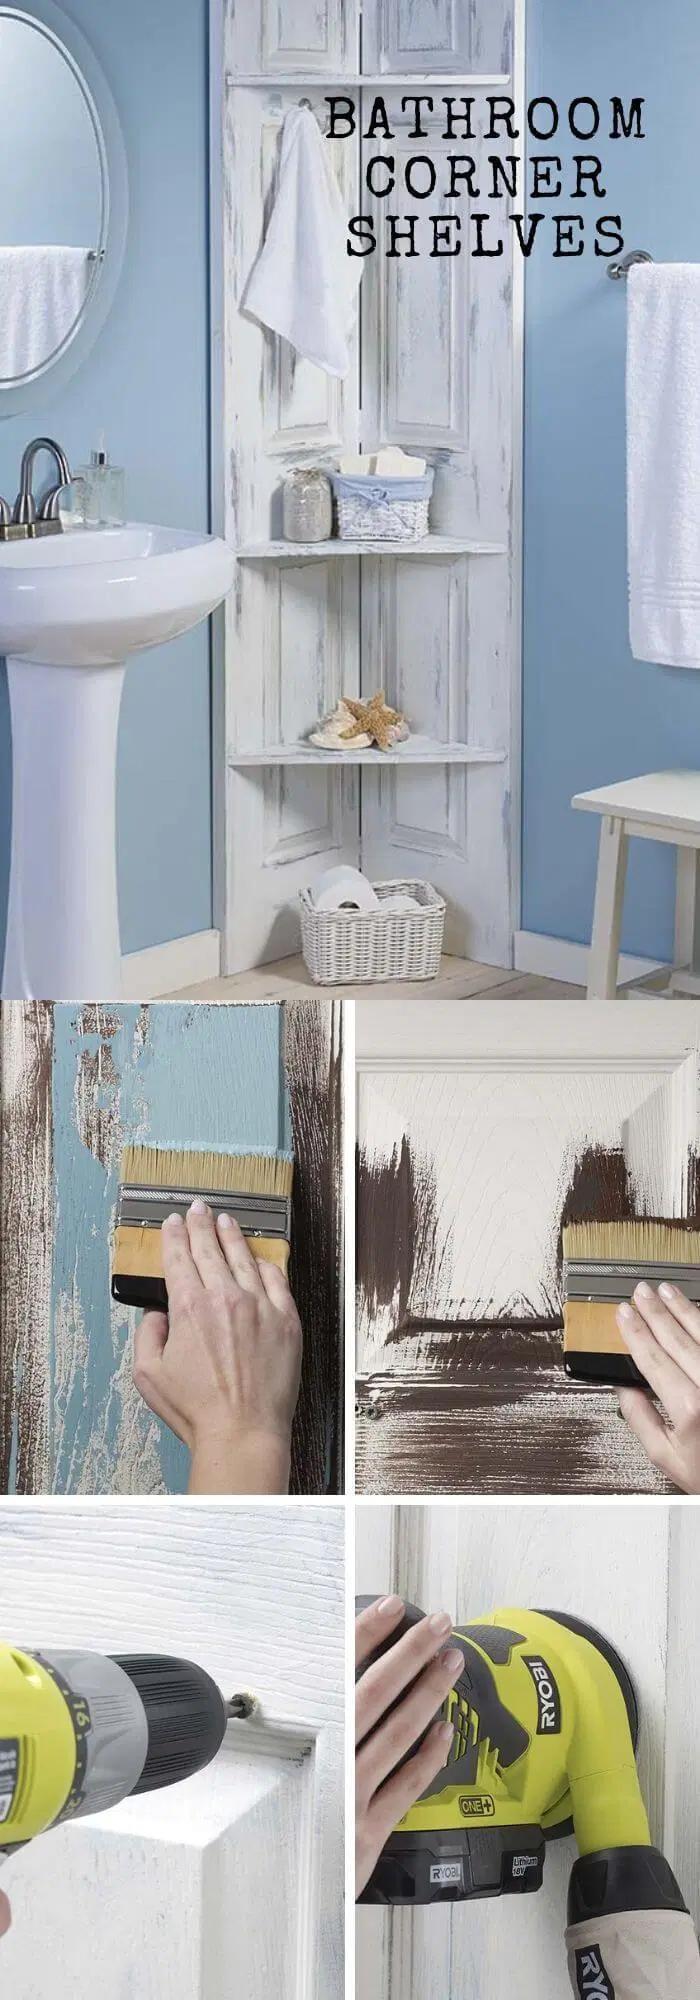 32 Awesome Diy Bathroom Shelf Ideas Designs For Tiny Bathroom Bathroom Shelves Diy Bathroom Corner Shelf Ideas